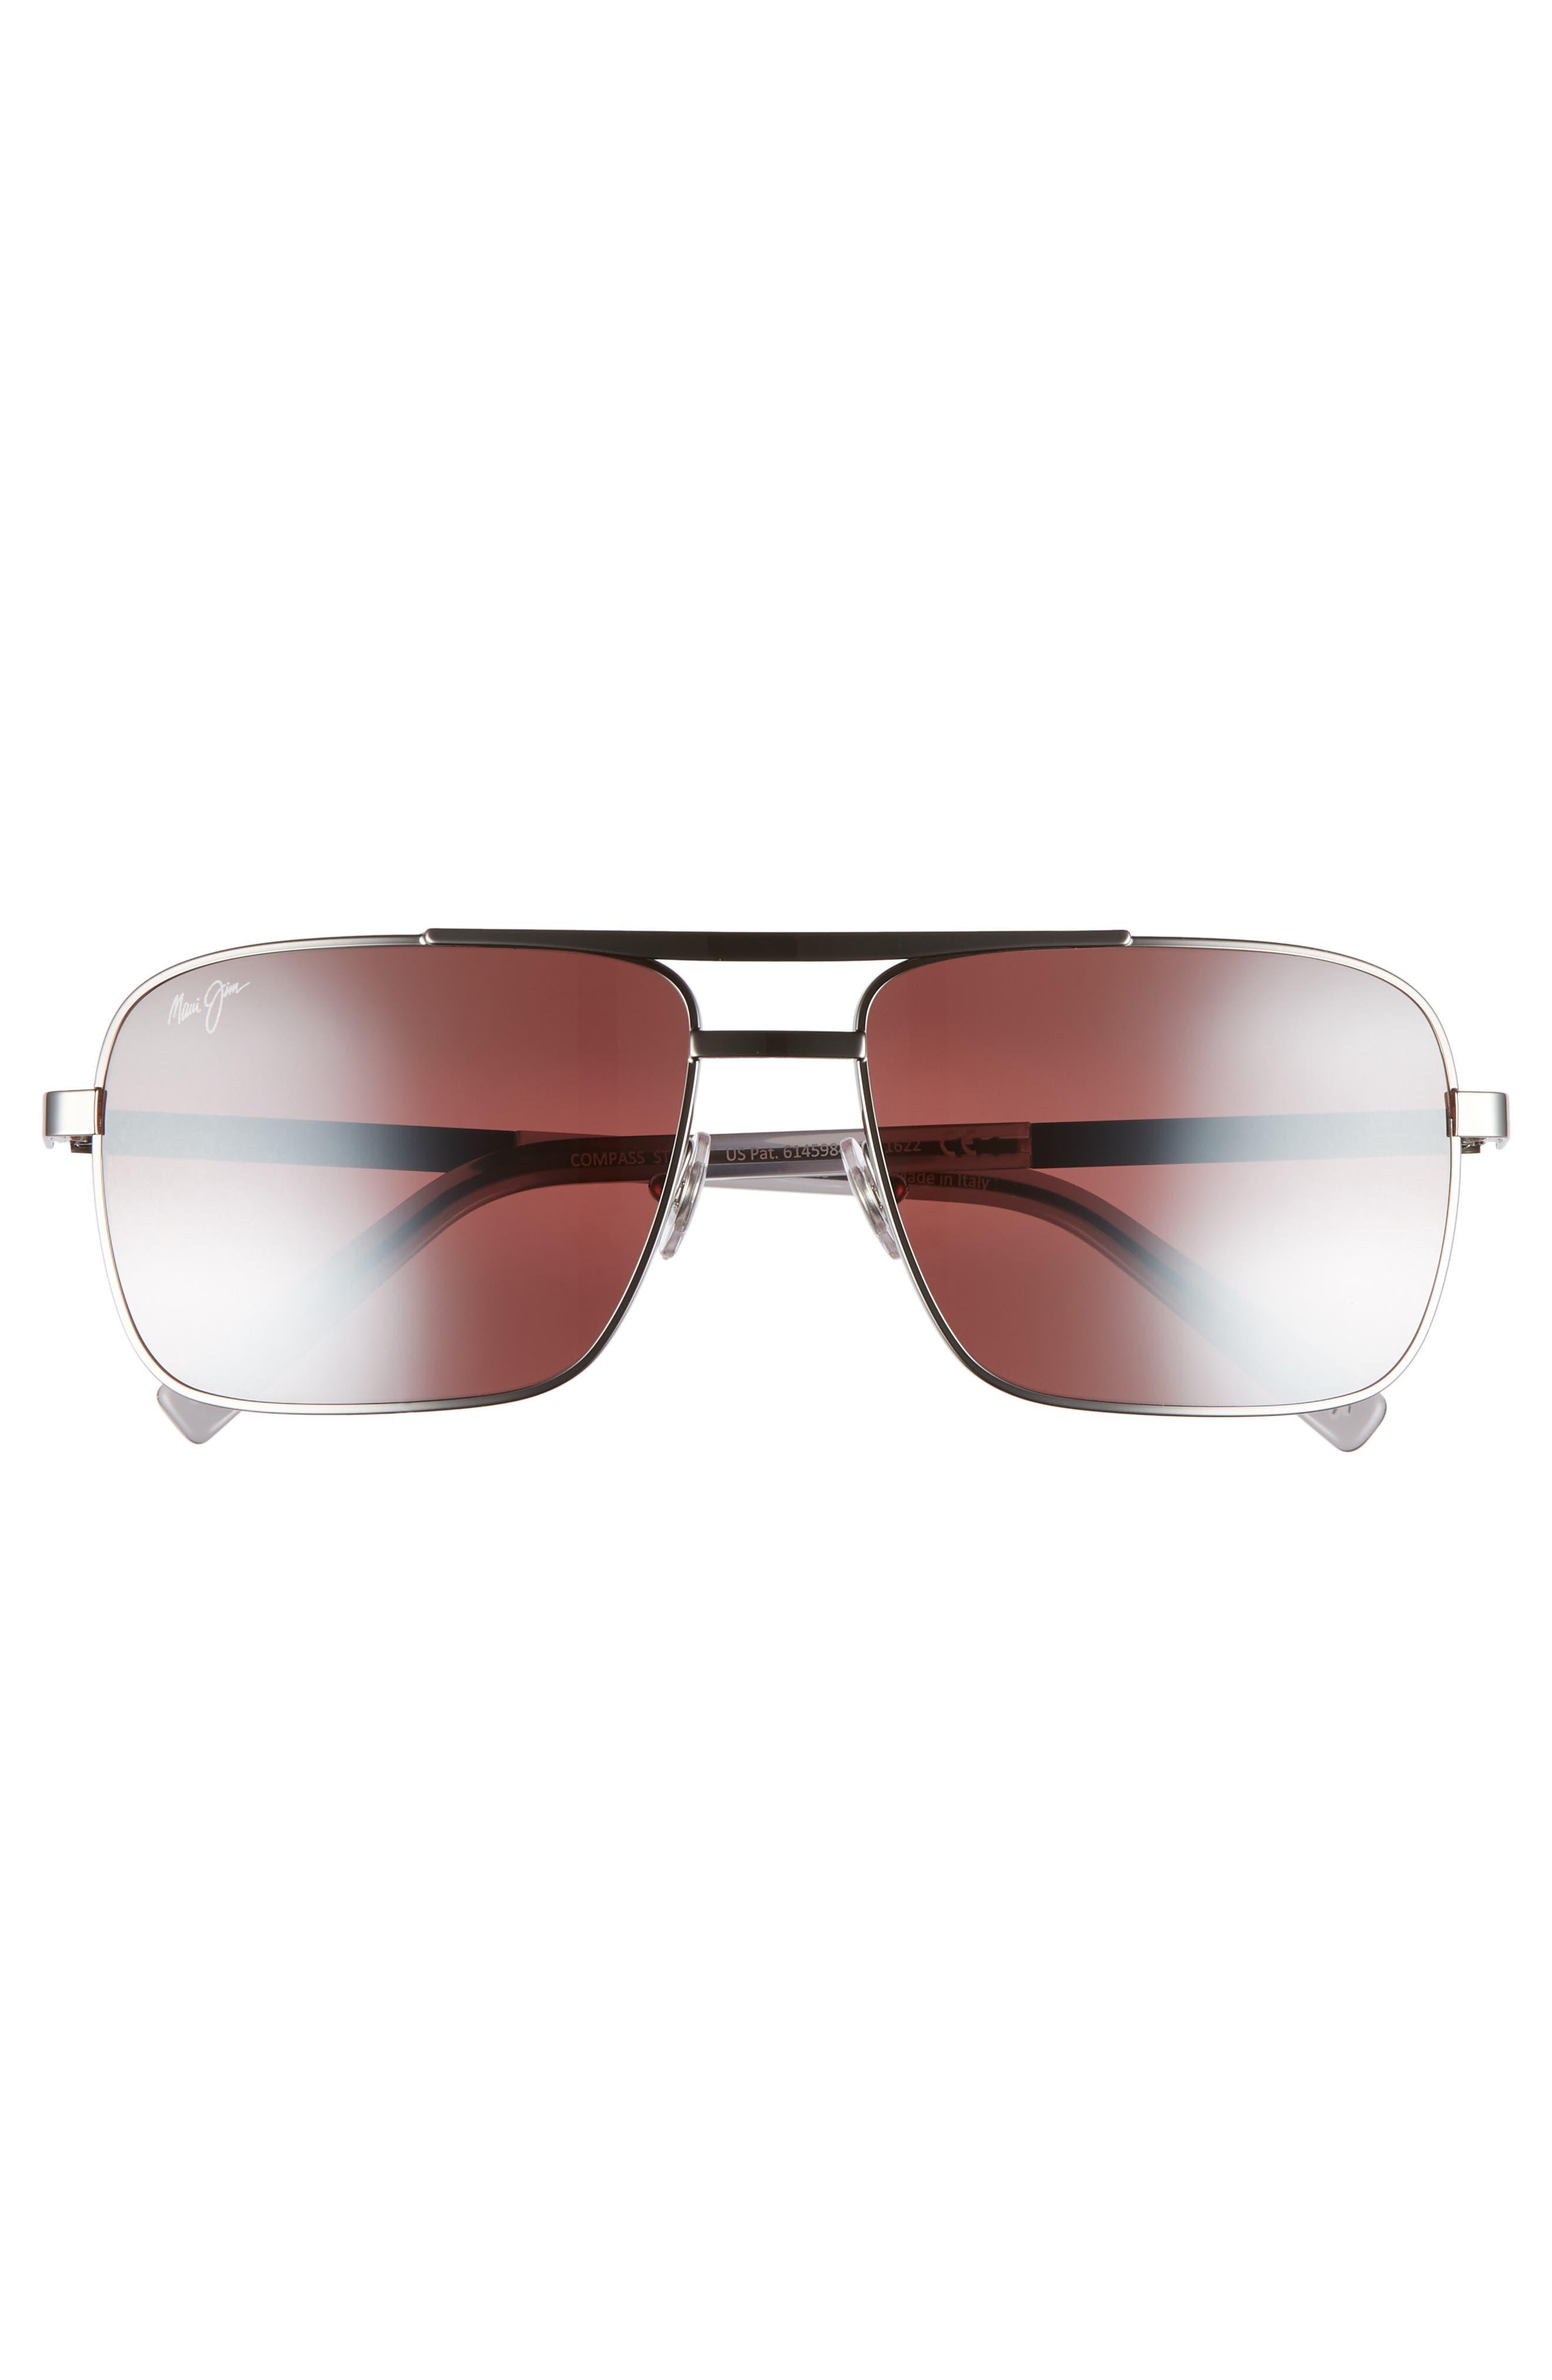 Compass 60mm Polarized Aviator Sunglasses,                             Alternate thumbnail 2, color,                             Silver/ Neutral Grey